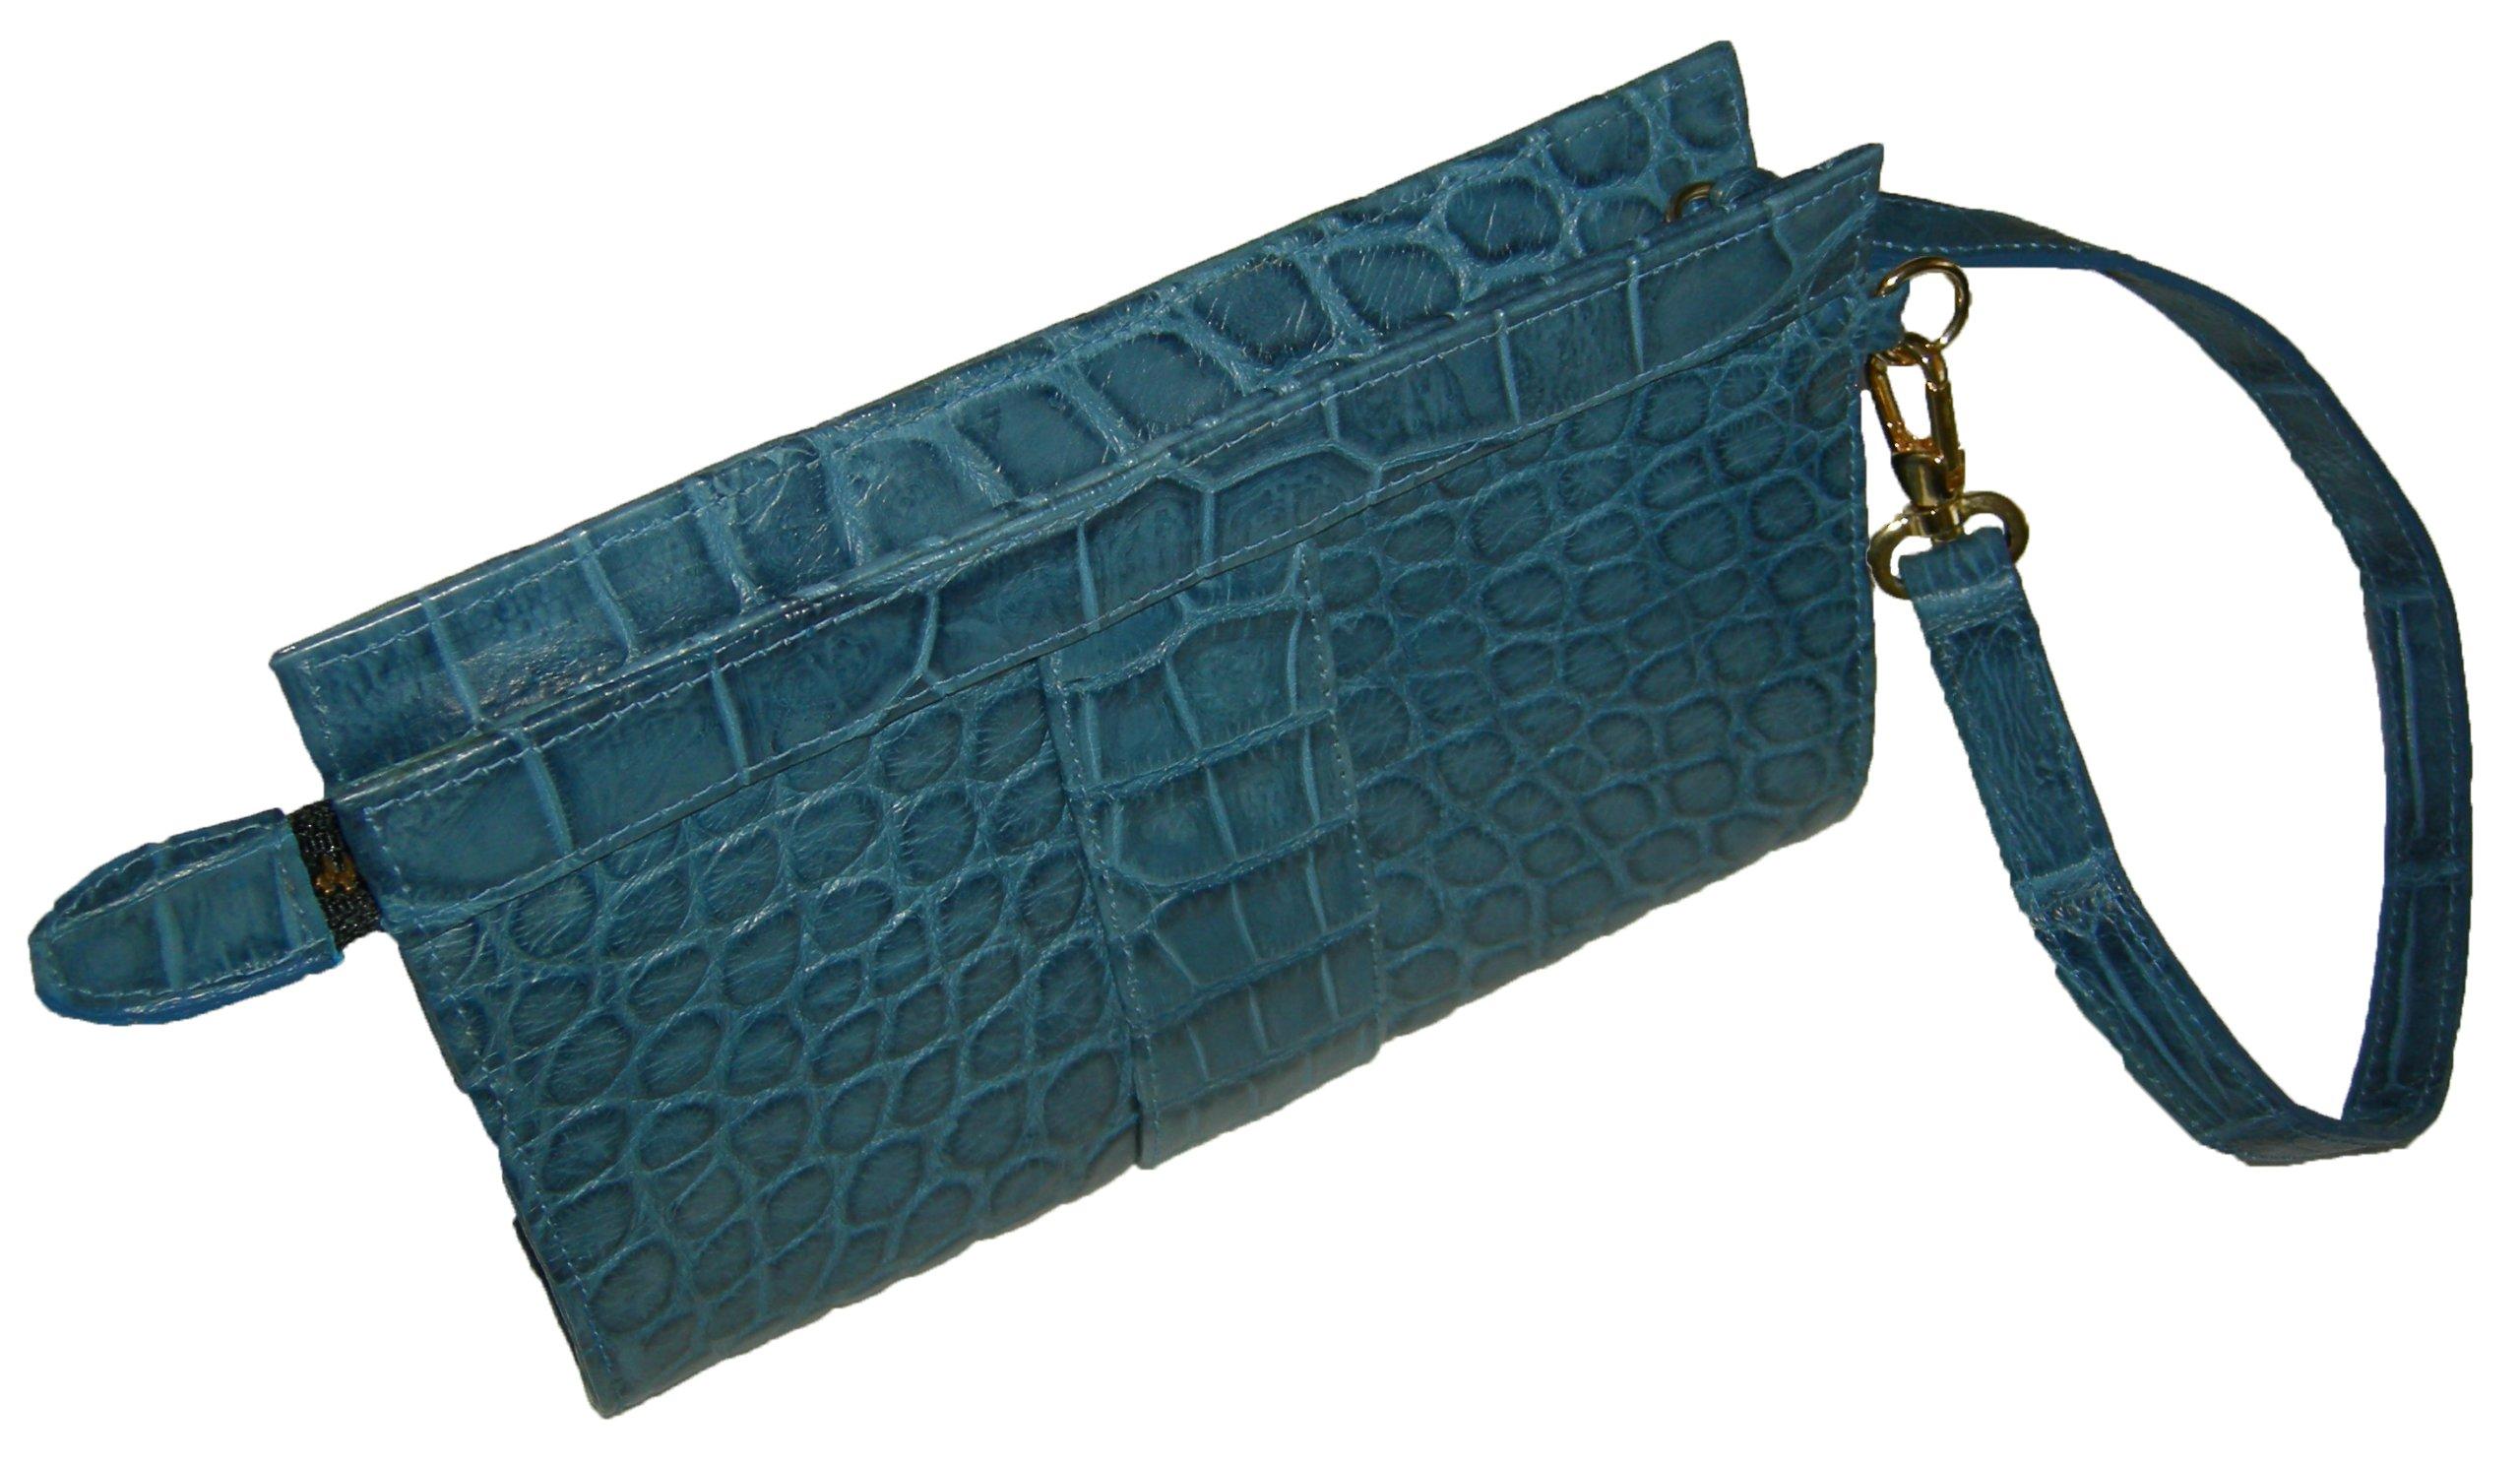 Sultan Genuine Alligator ''Bluum'' Wristlet Bag - Light Blue (Matte) - One Size